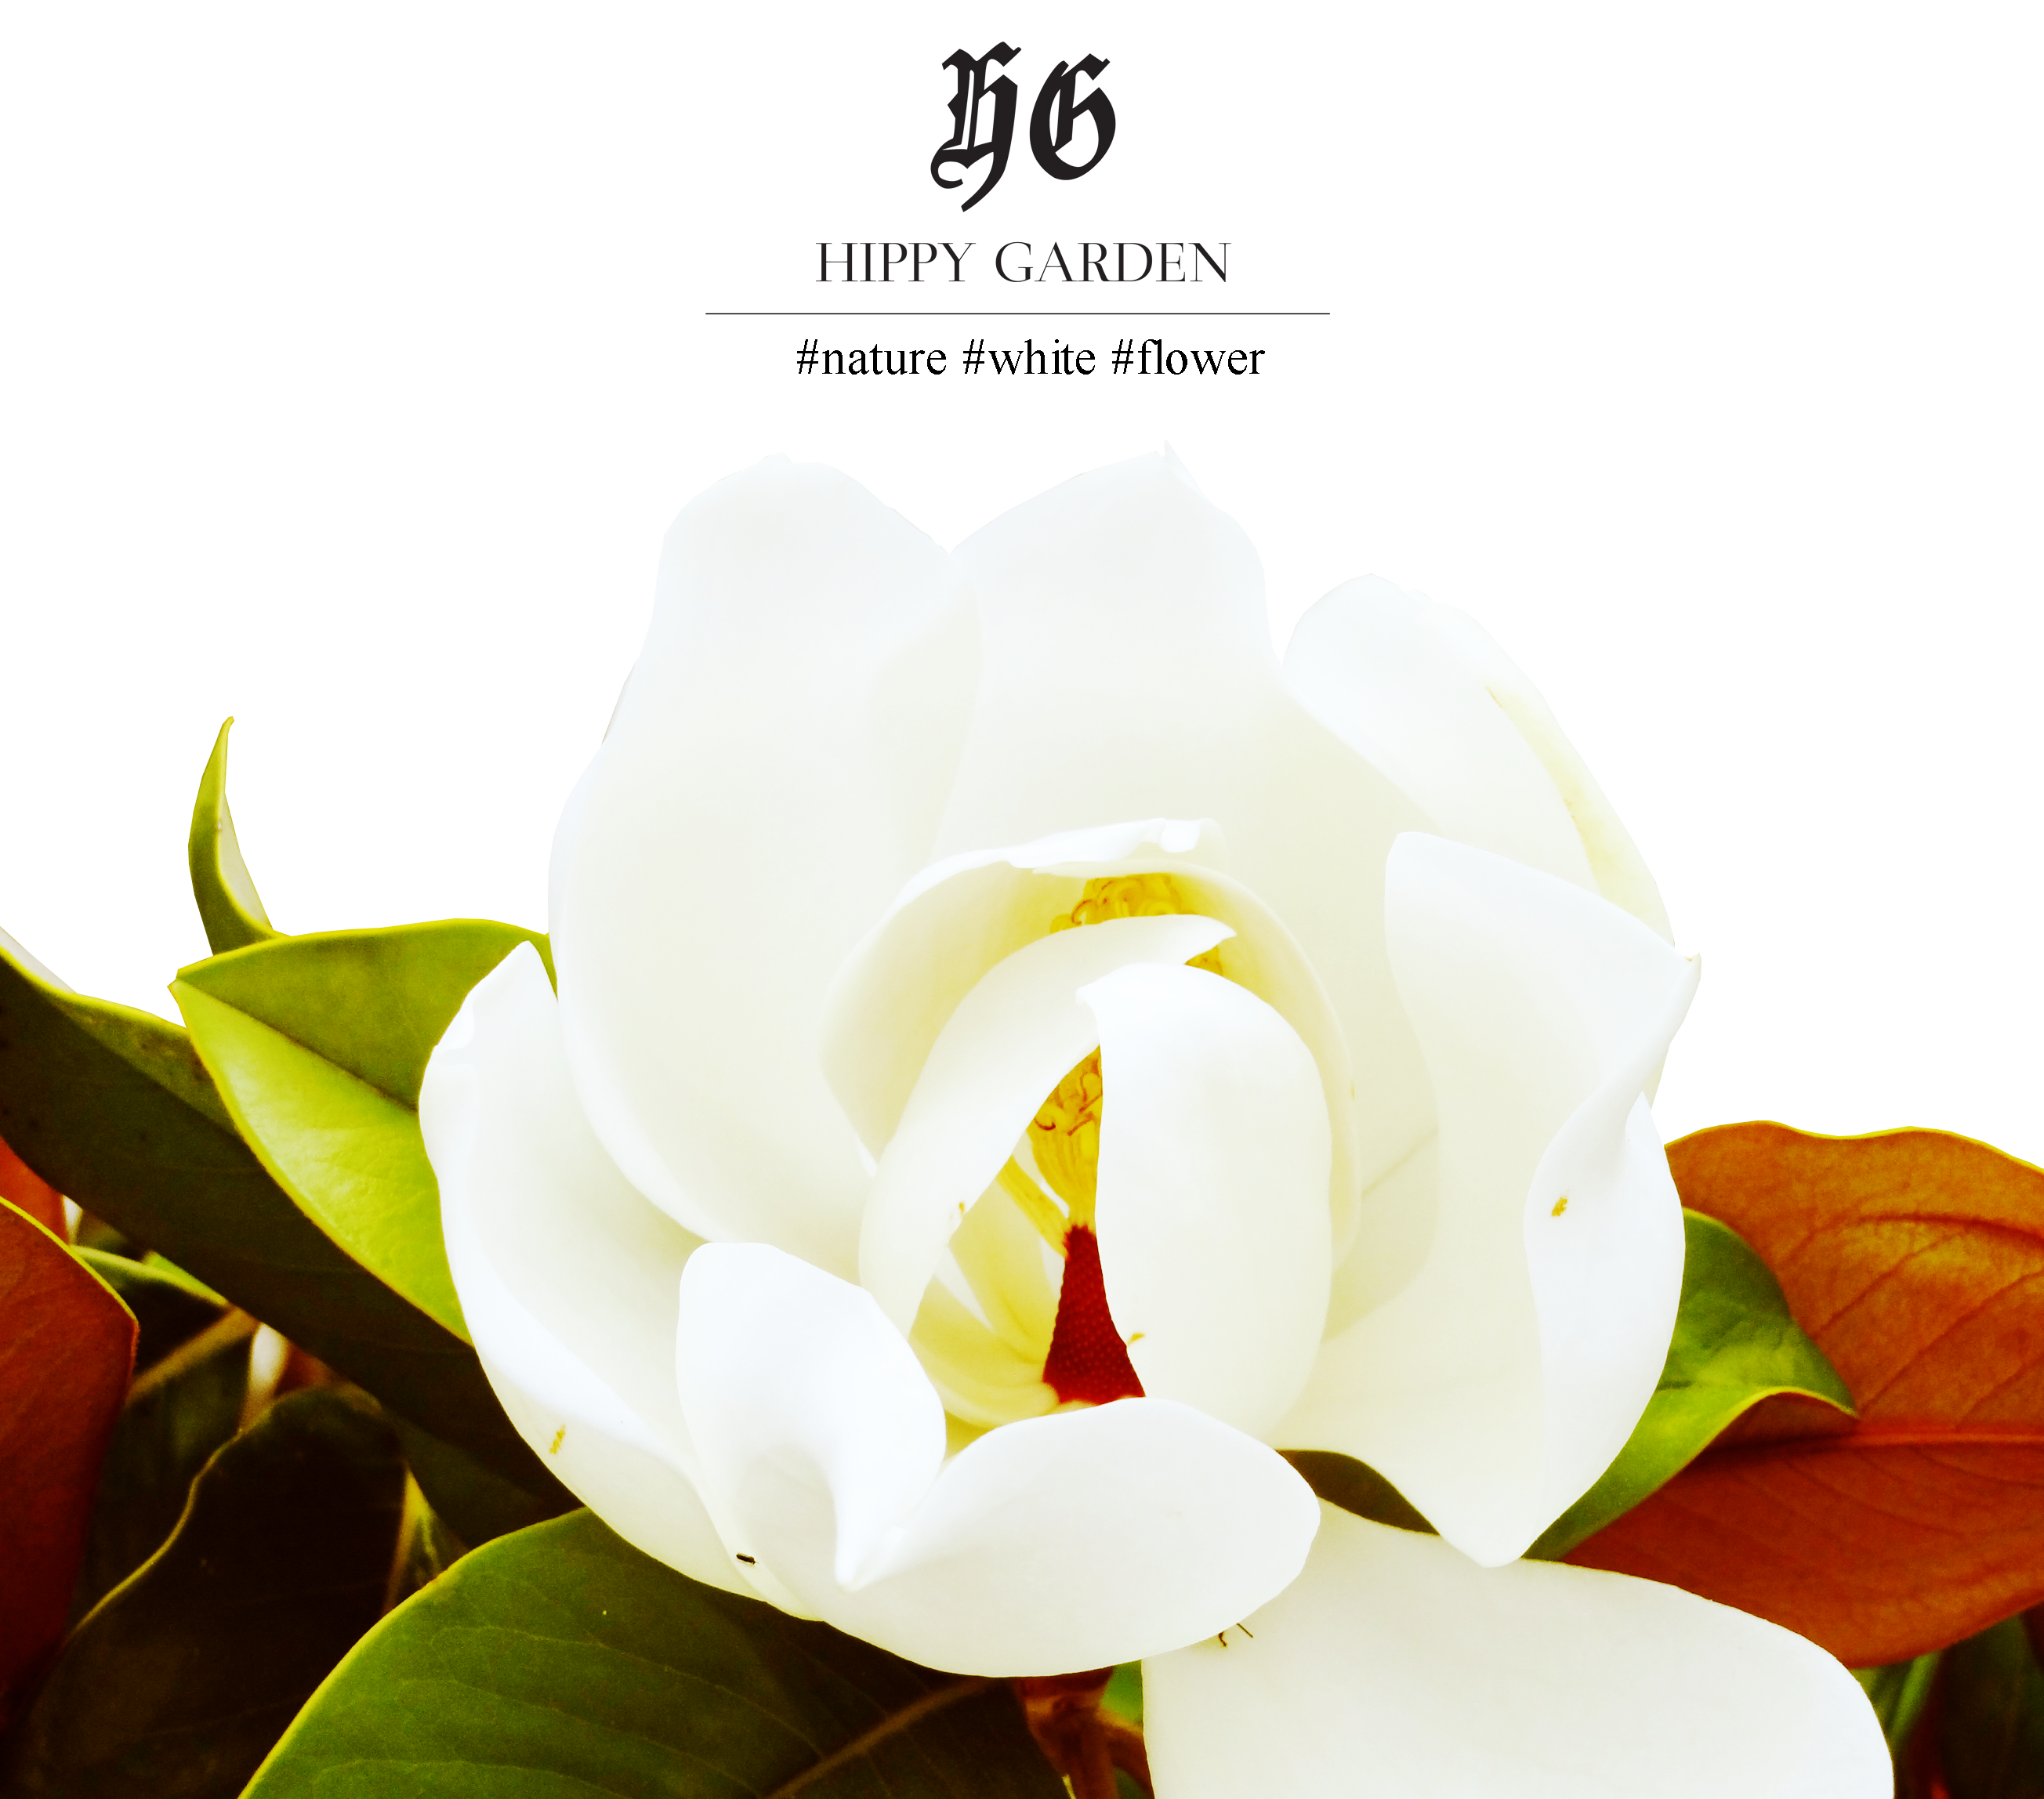 Hippy Garden Showroom Masarykova 5 http://hippygarden.net/products-page/dresses/  #fashion #brand #design #hippygarden #croatia #masarykova5 #love #nature #flower #beautiful